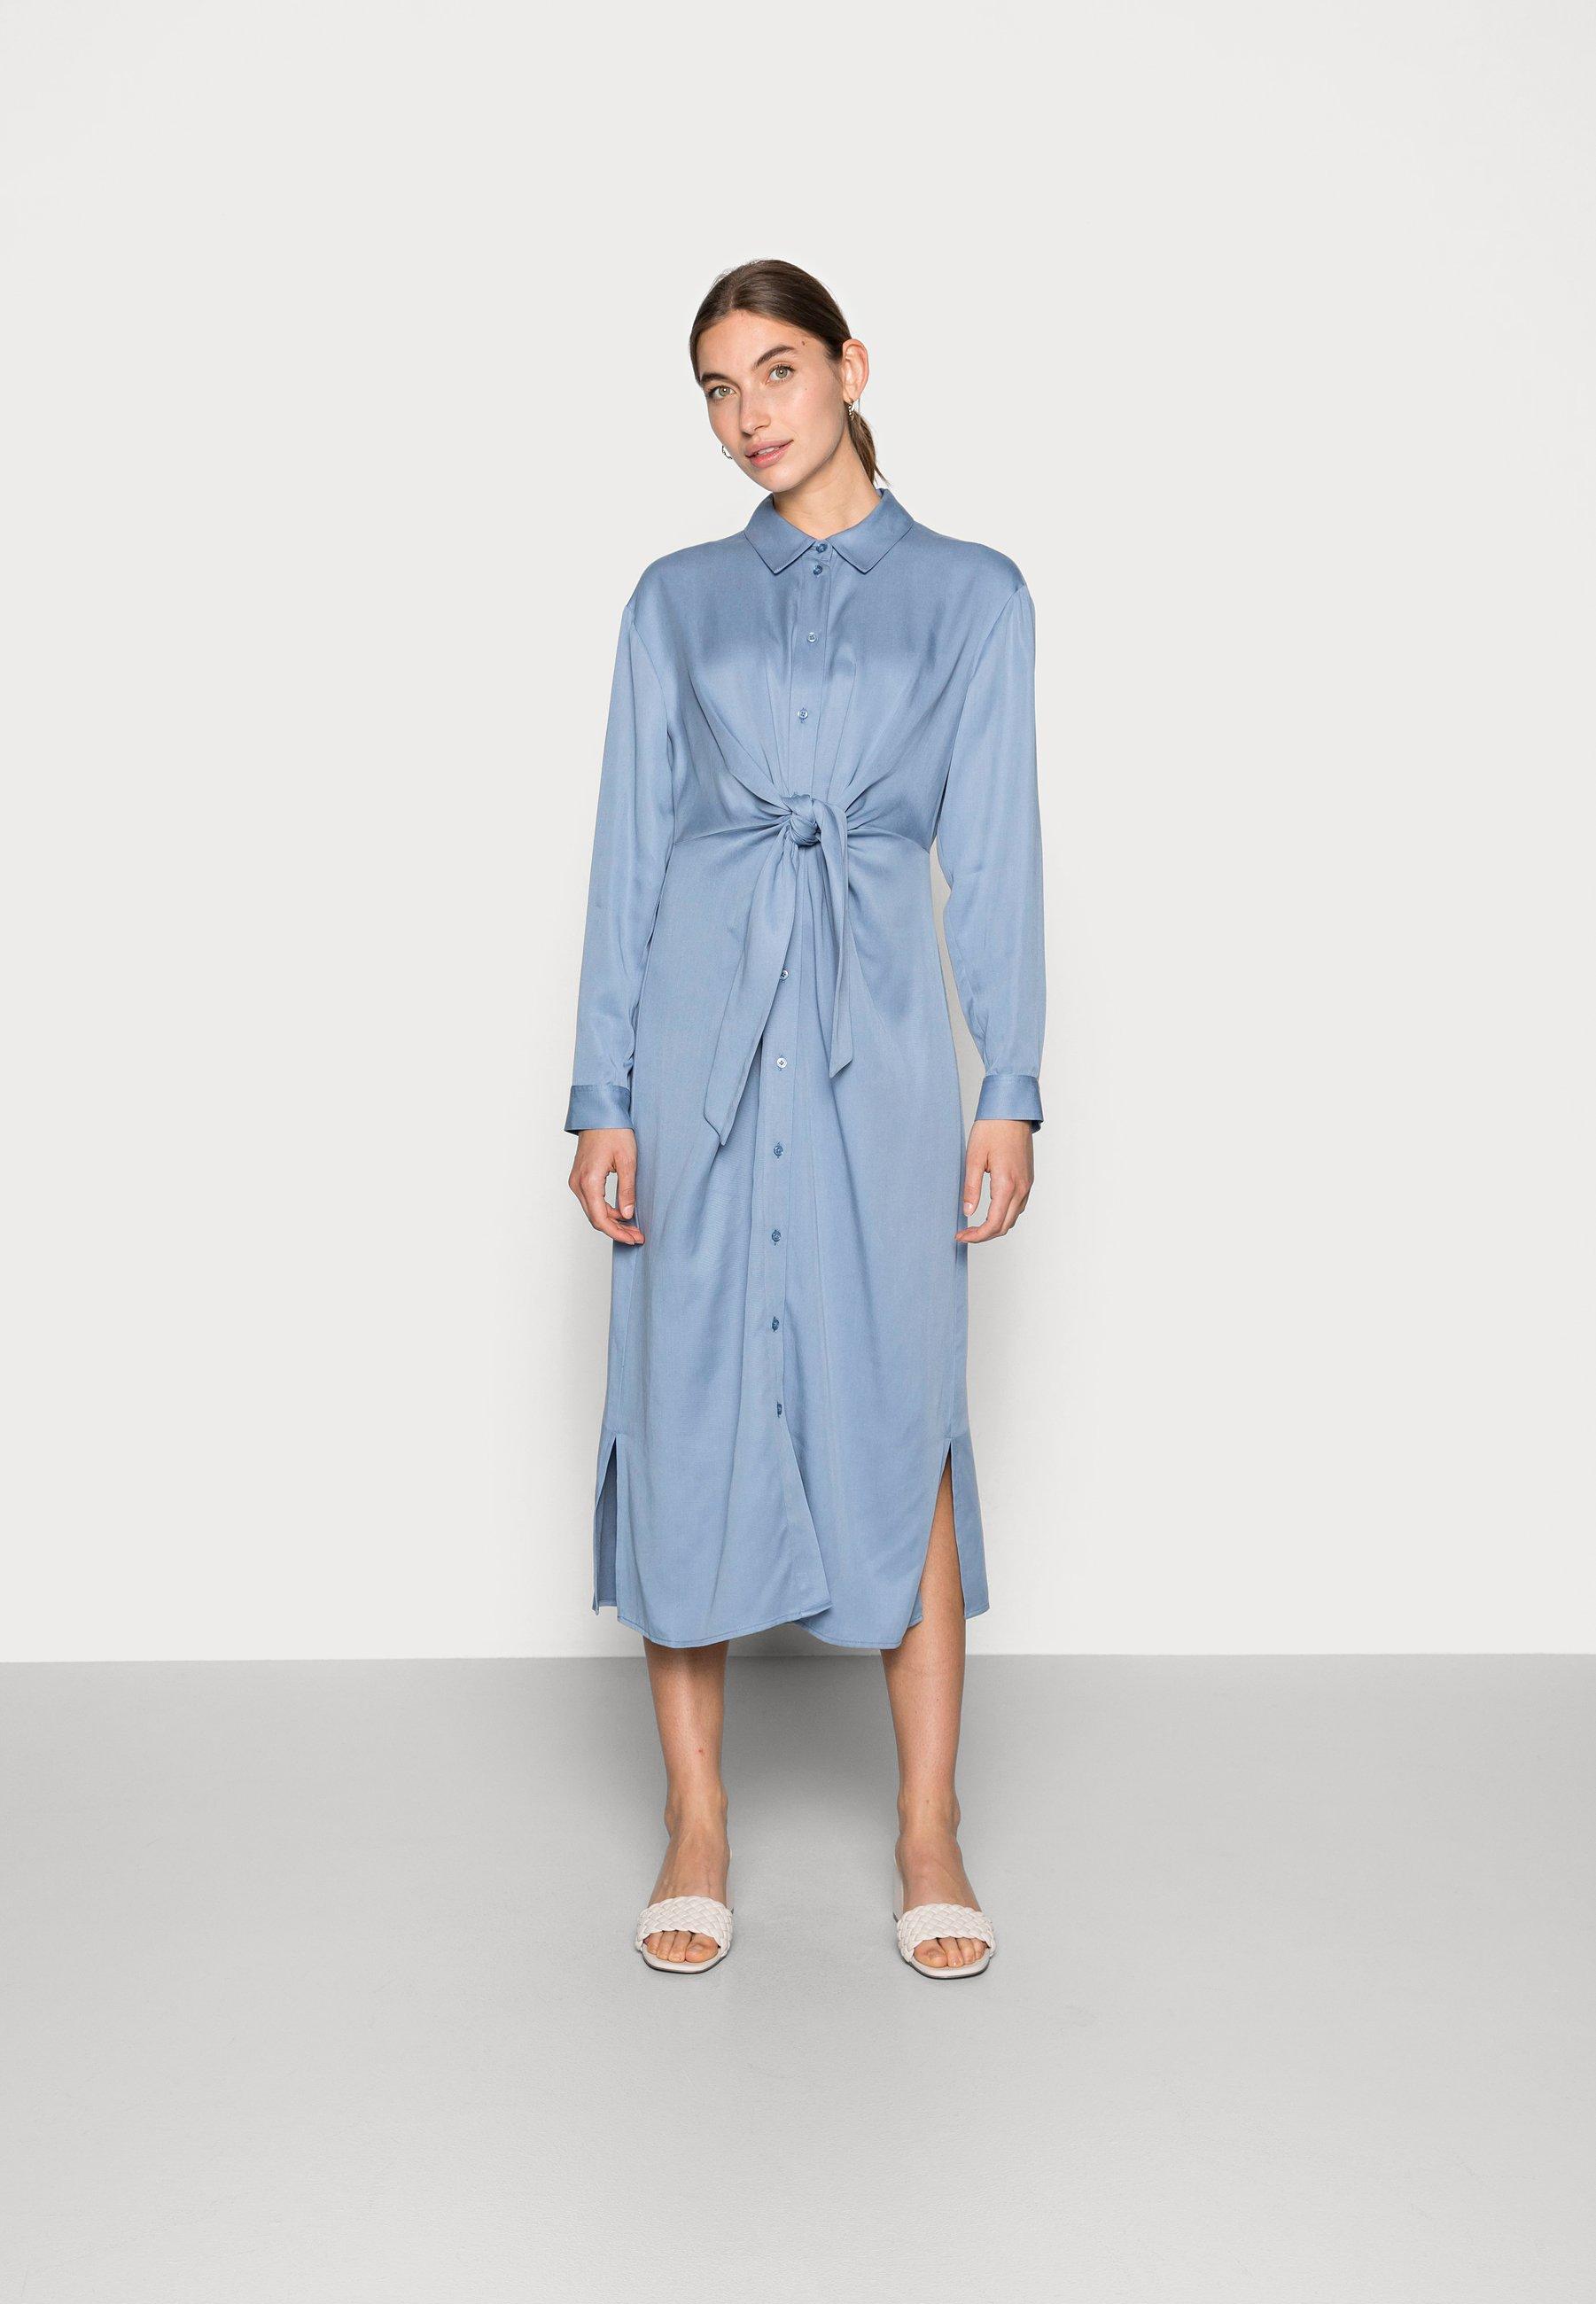 Damen OBI DRESS - Blusenkleid